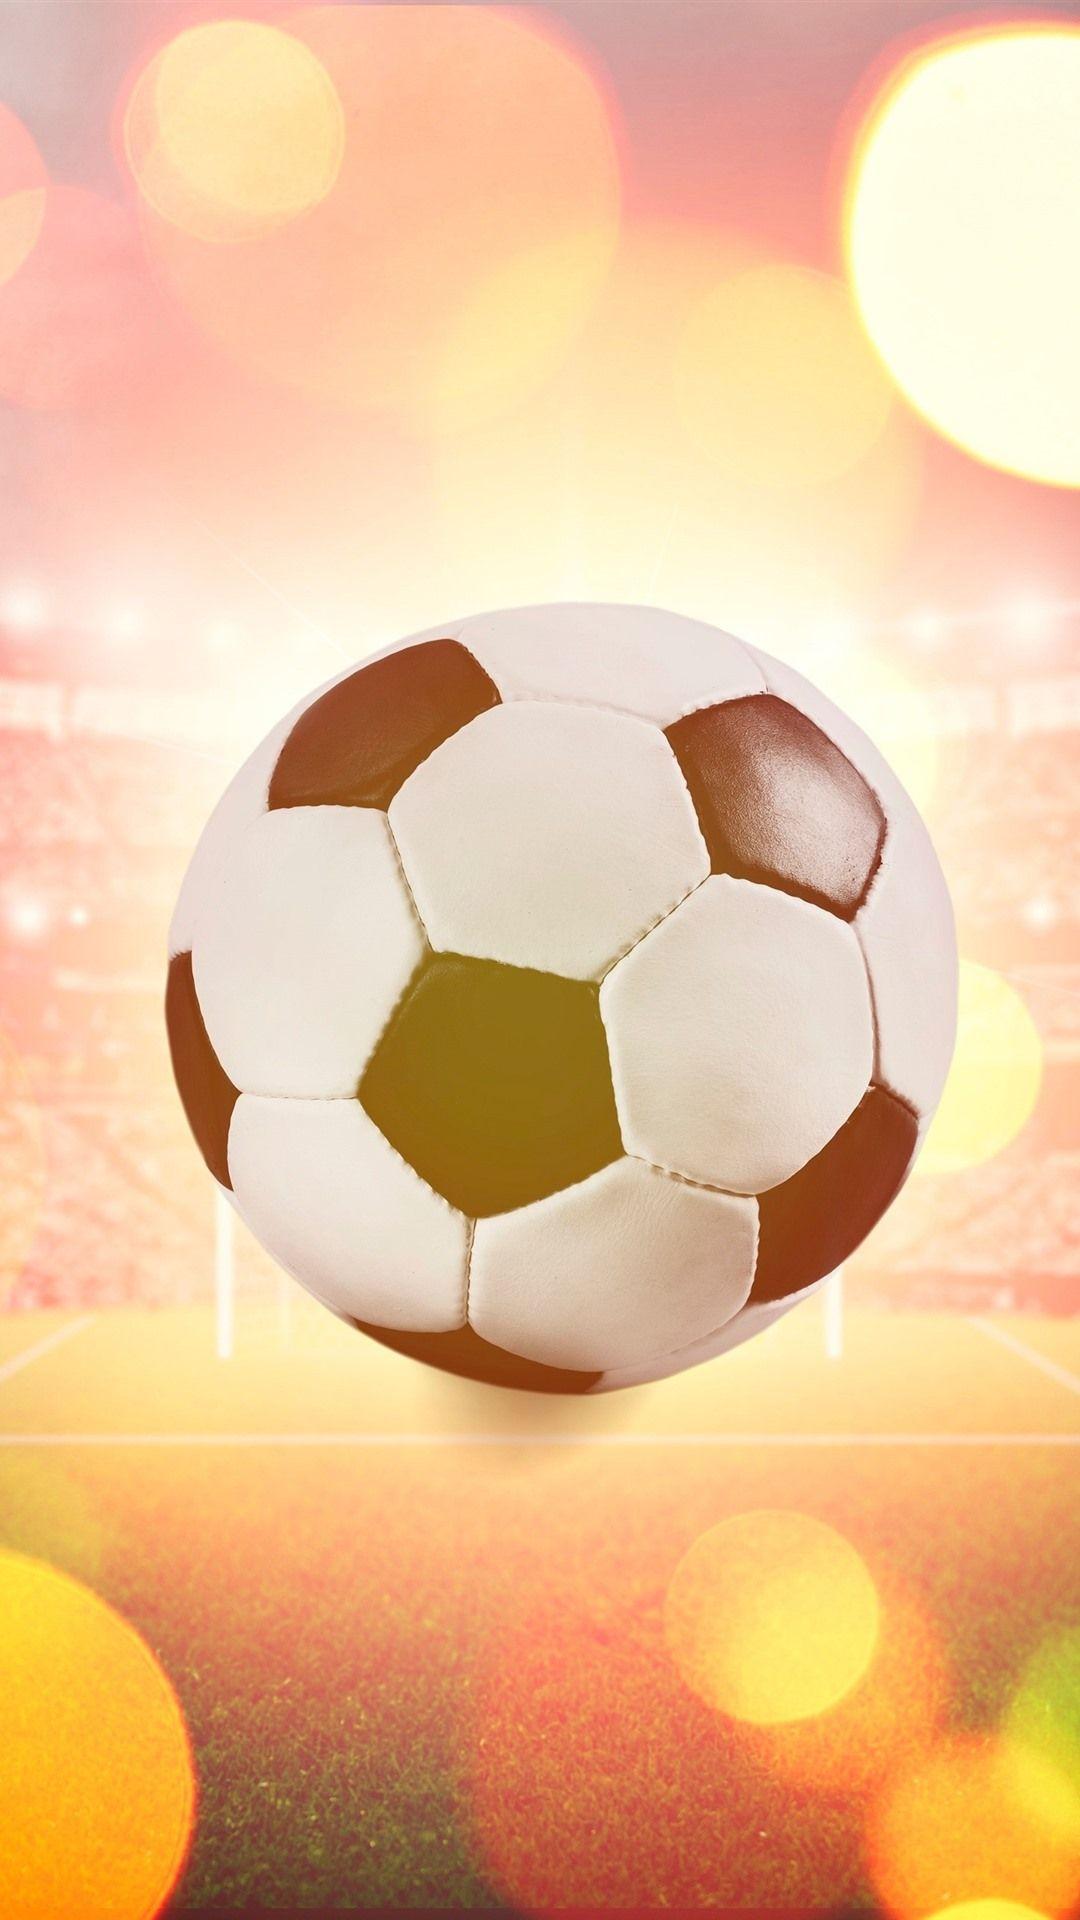 Soccer Wallpaper Girl : soccer, wallpaper, Soccer, Iphone, Background, Background,, Girl,